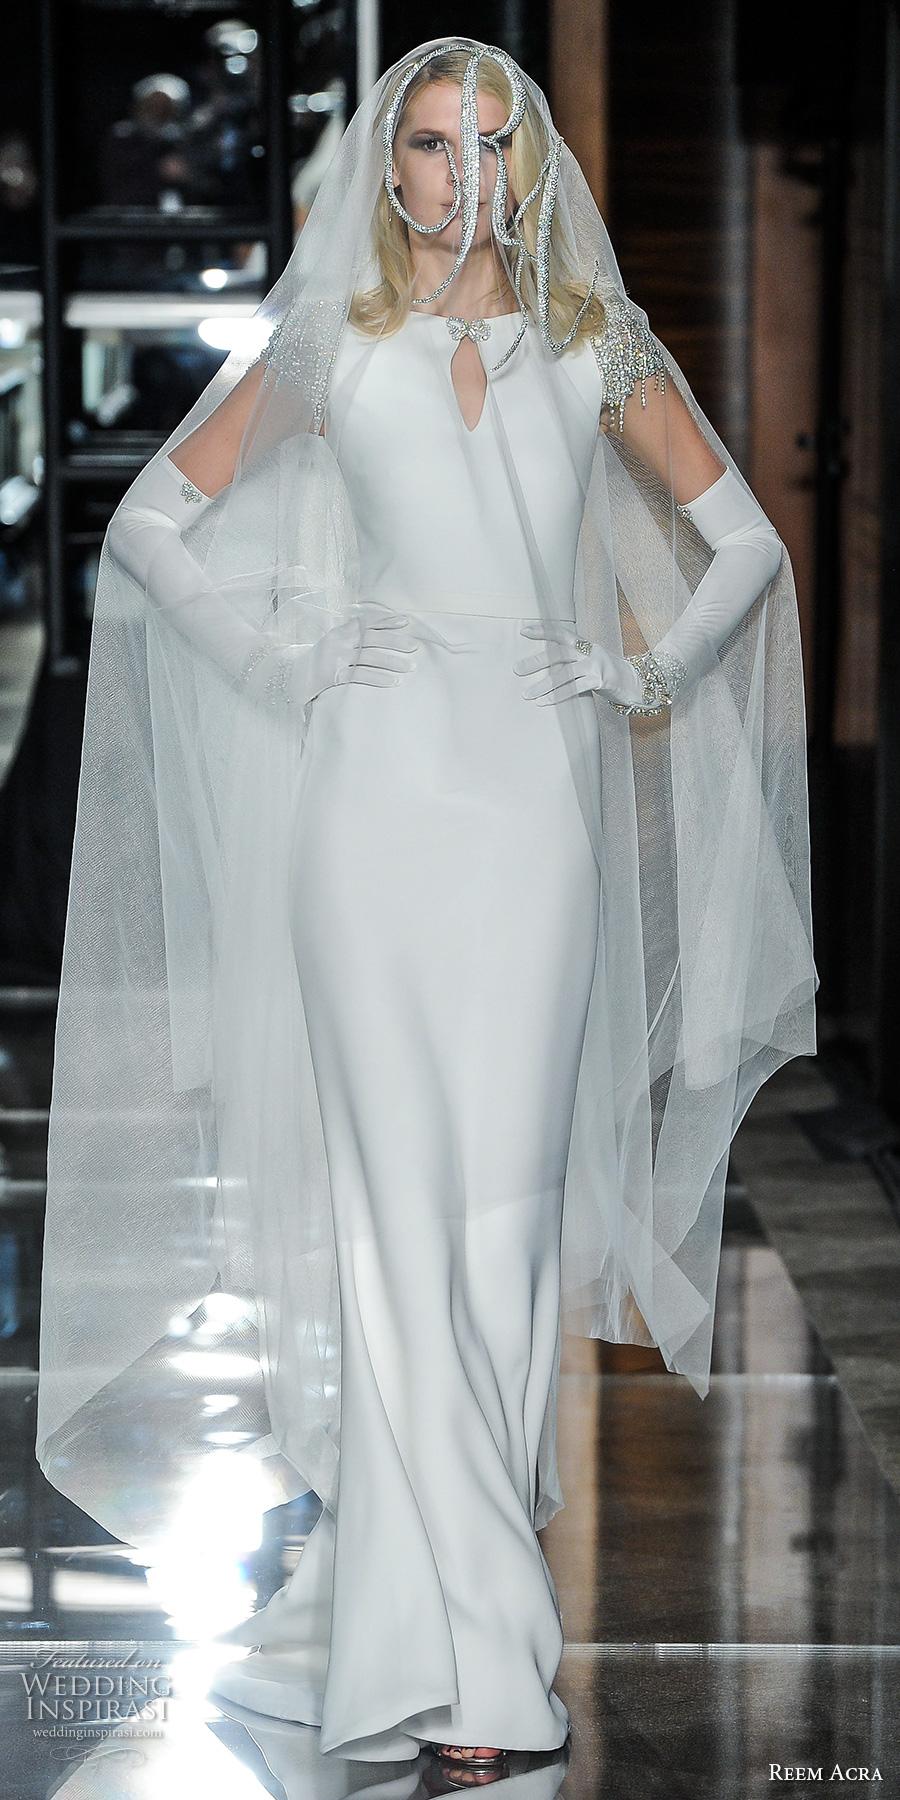 Reem Acra Wedding Gown 78 Luxury reem acra spring bridal